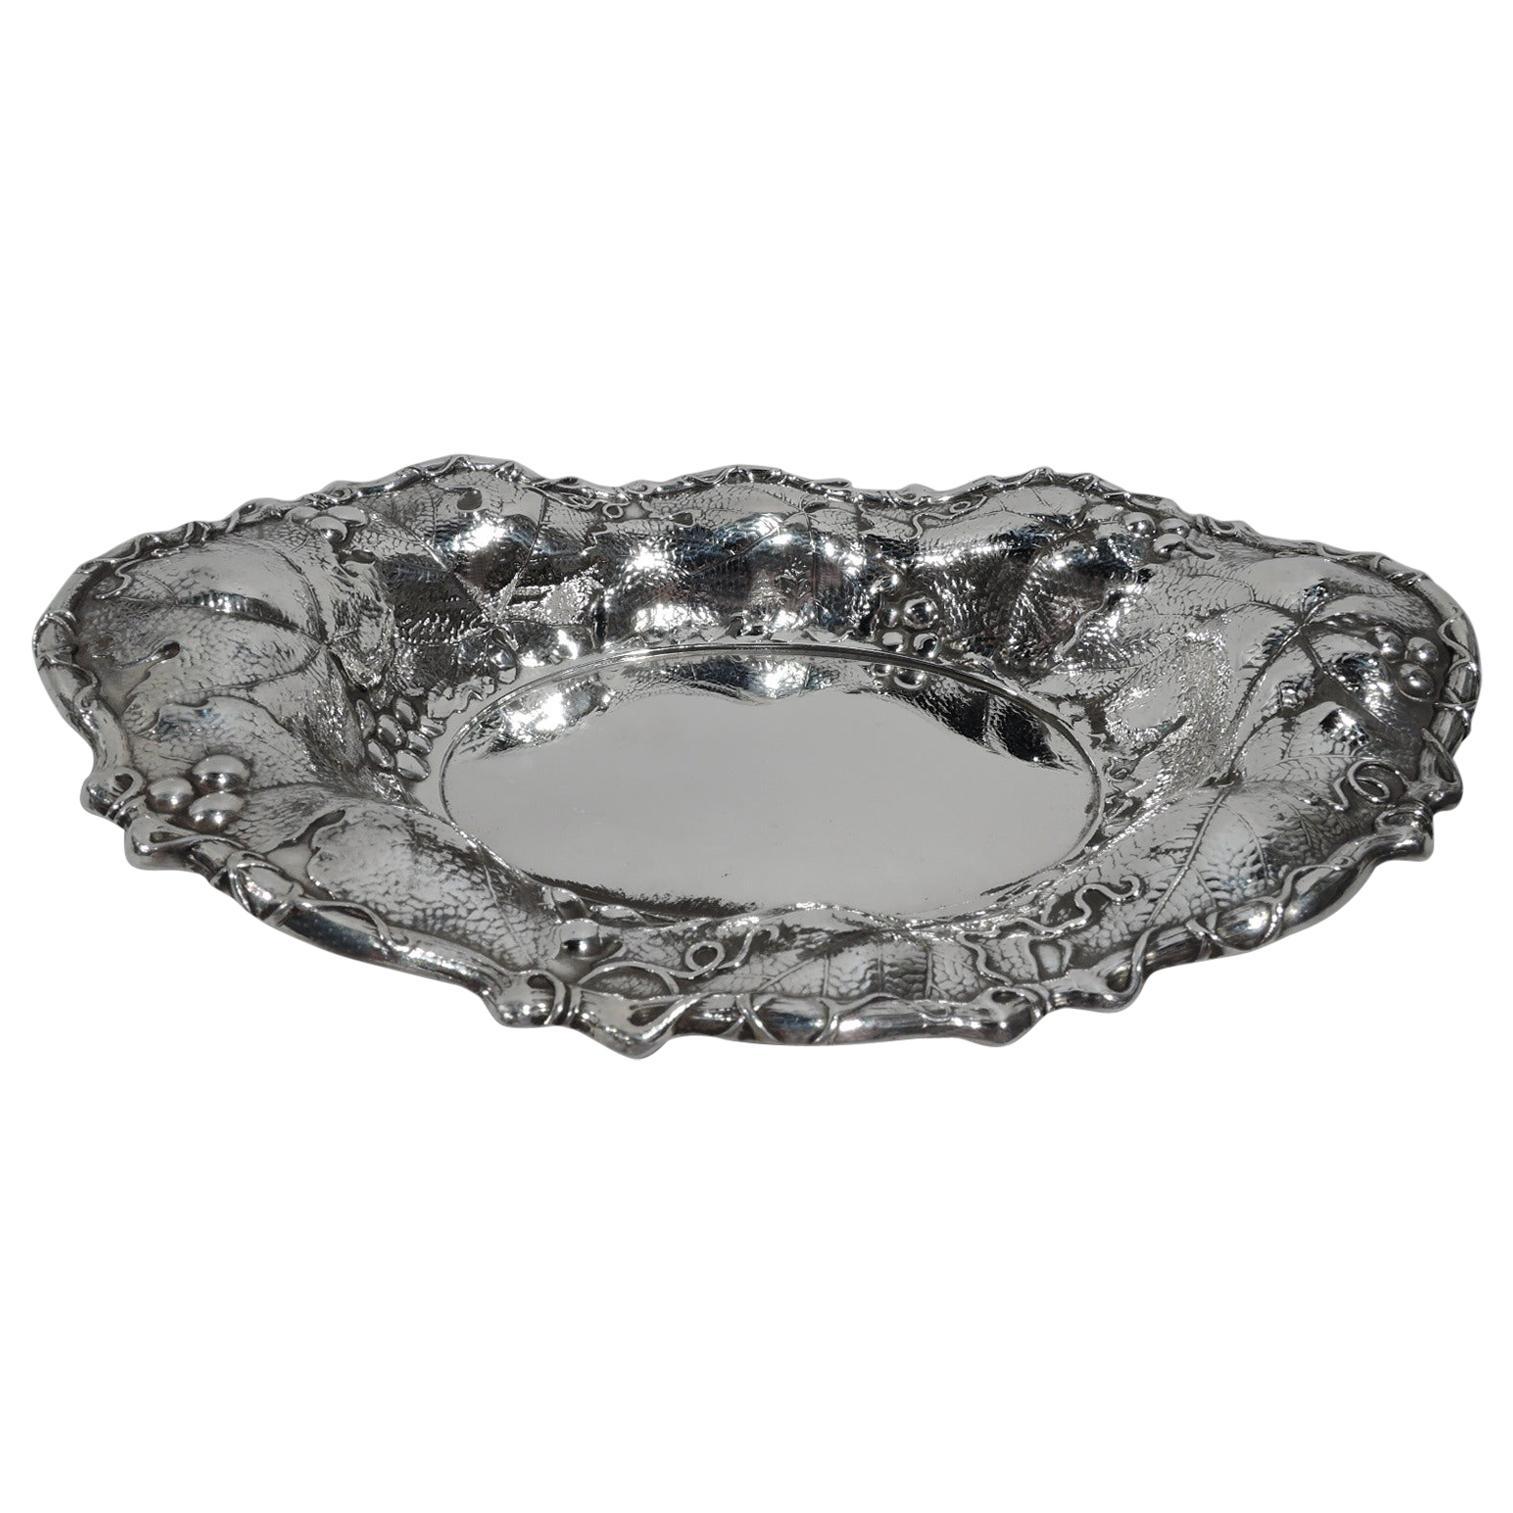 Antique Whiting Art Nouveau Sterling Silver Bowl